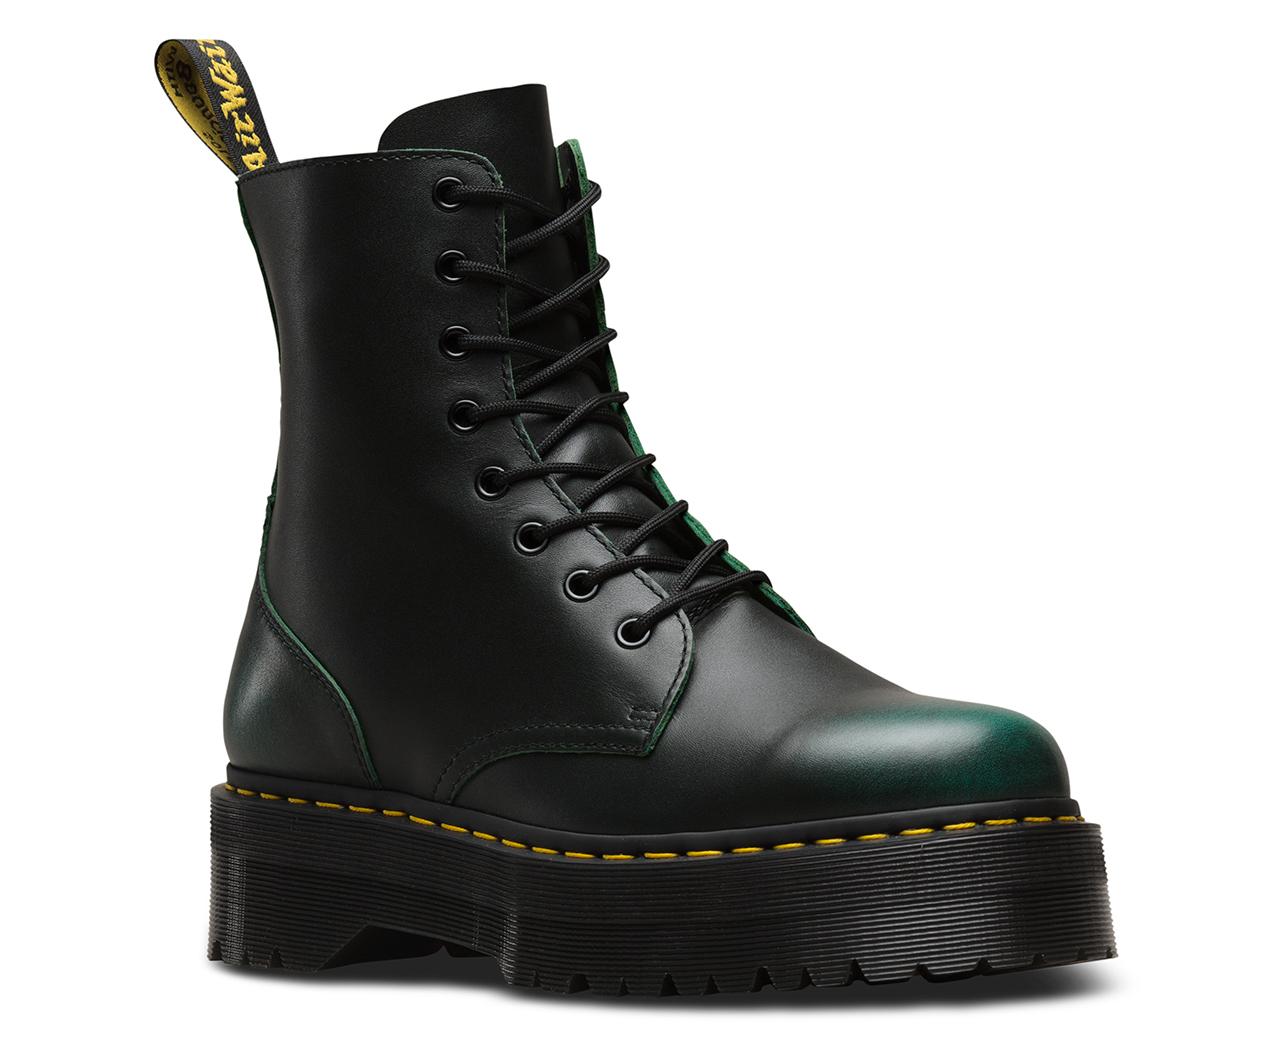 JADON VINTAGE | Women's Boots | Dr. Martens Official